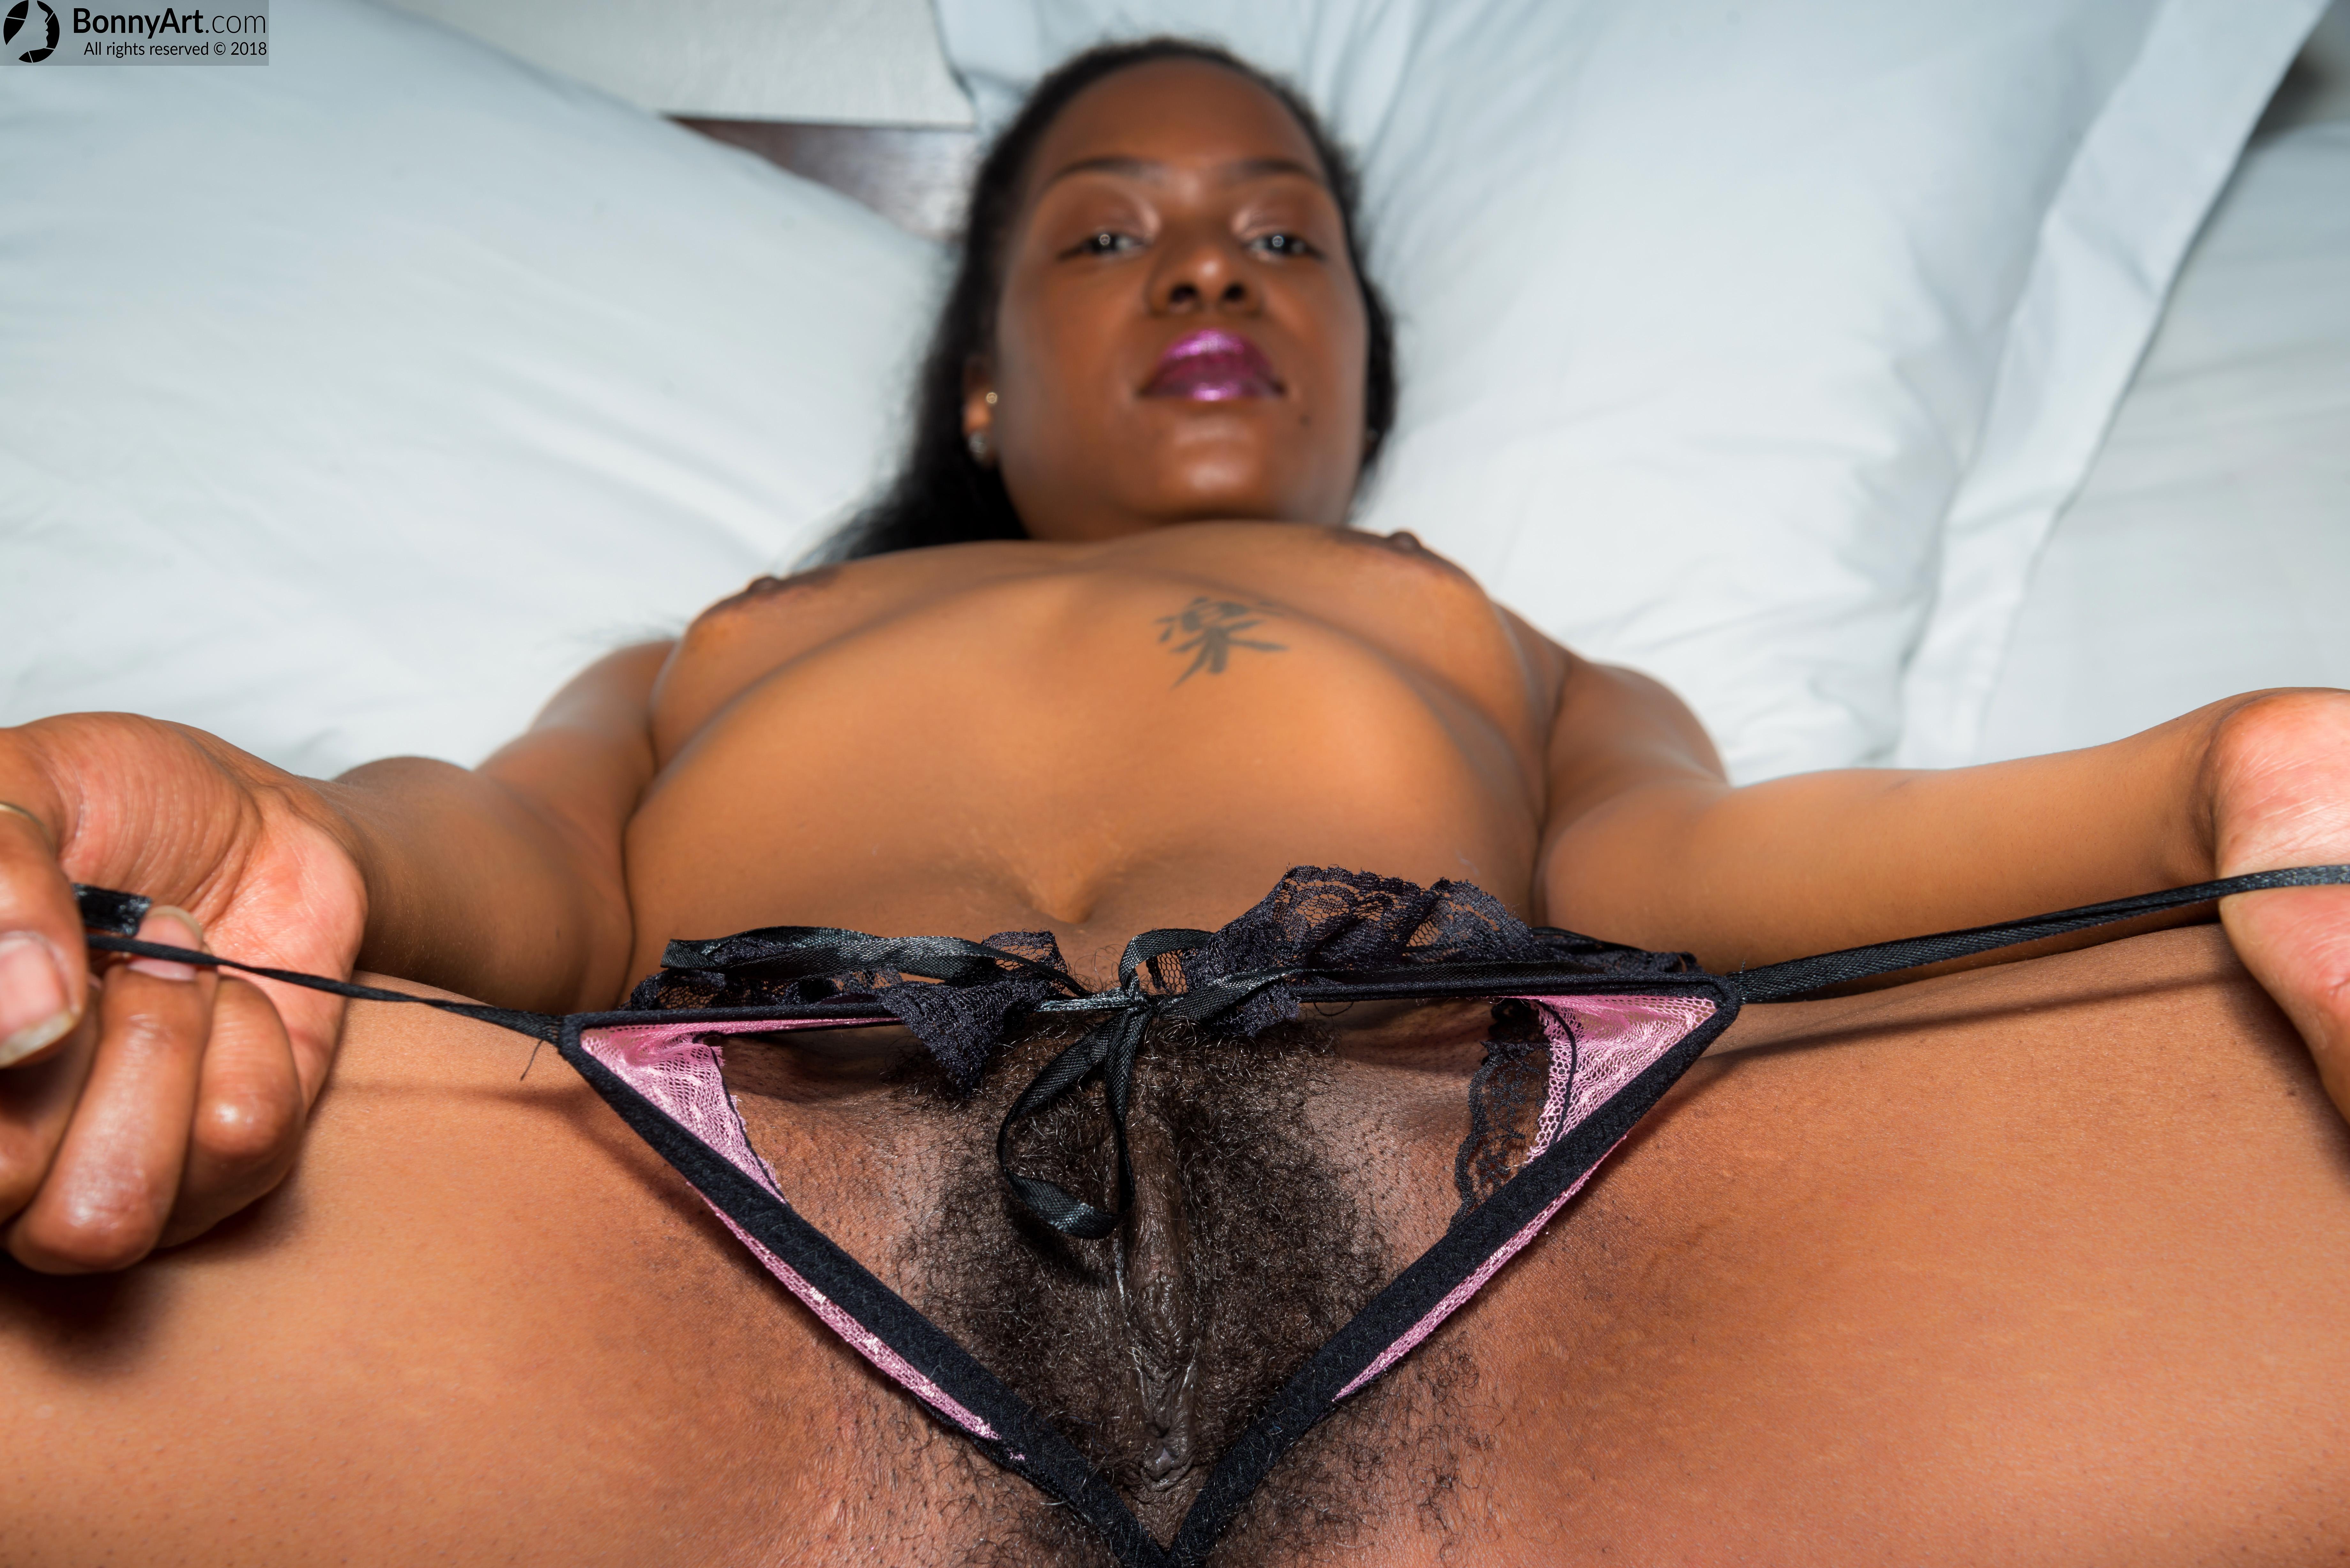 Showing her Ebony Unshaven Vulva Crotchless Panties